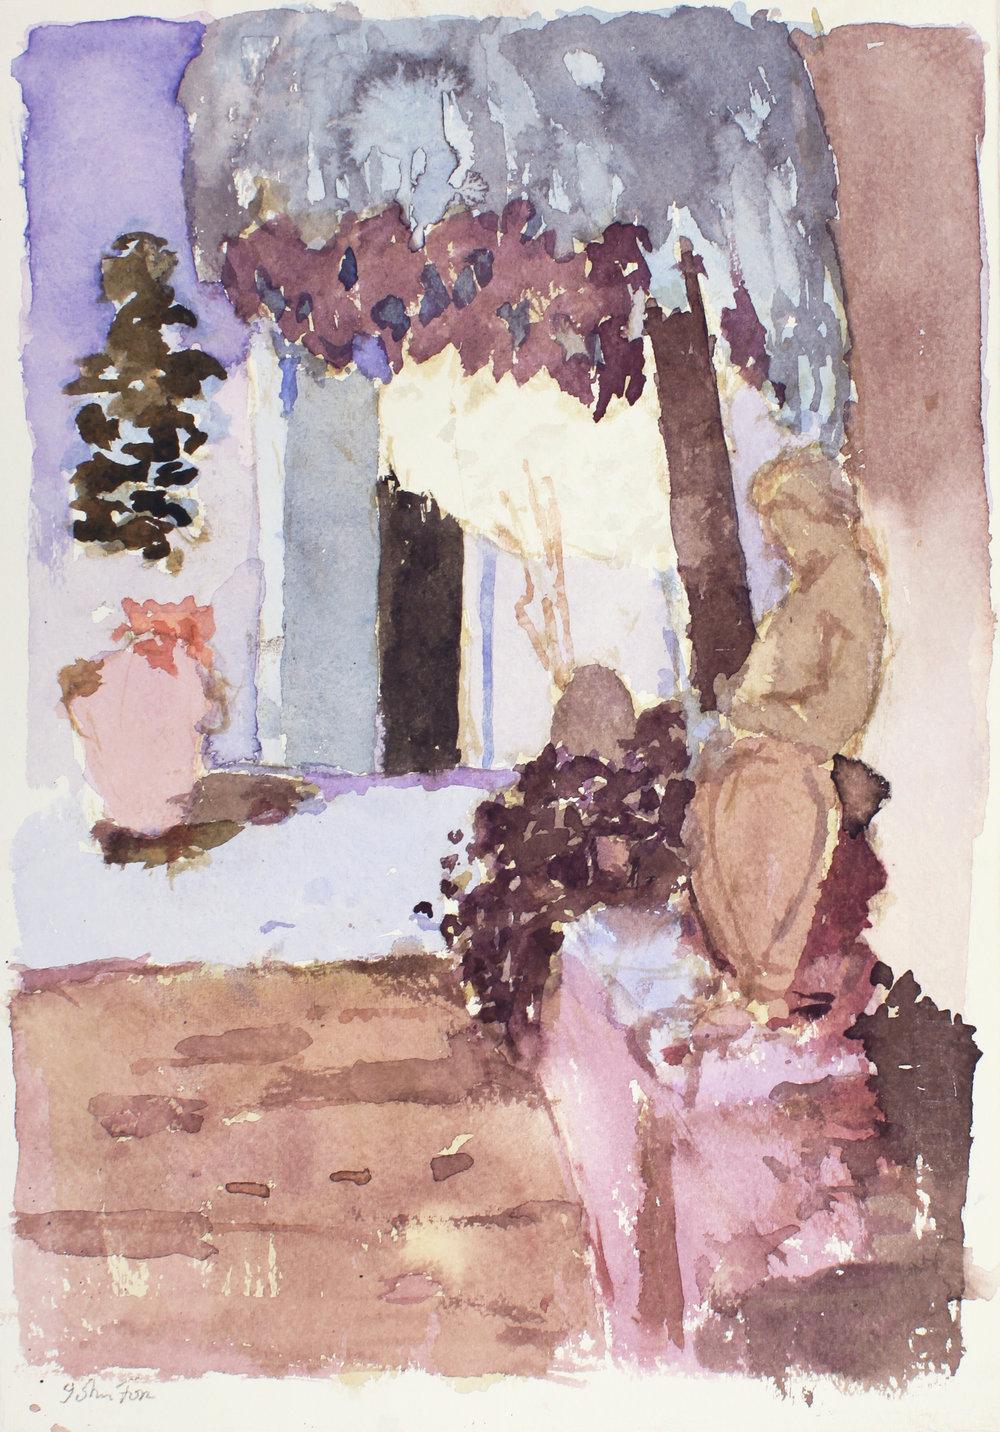 1997_Habsburg_Garden_watercolour_on_paper_14x10in_-WPF330.jpg